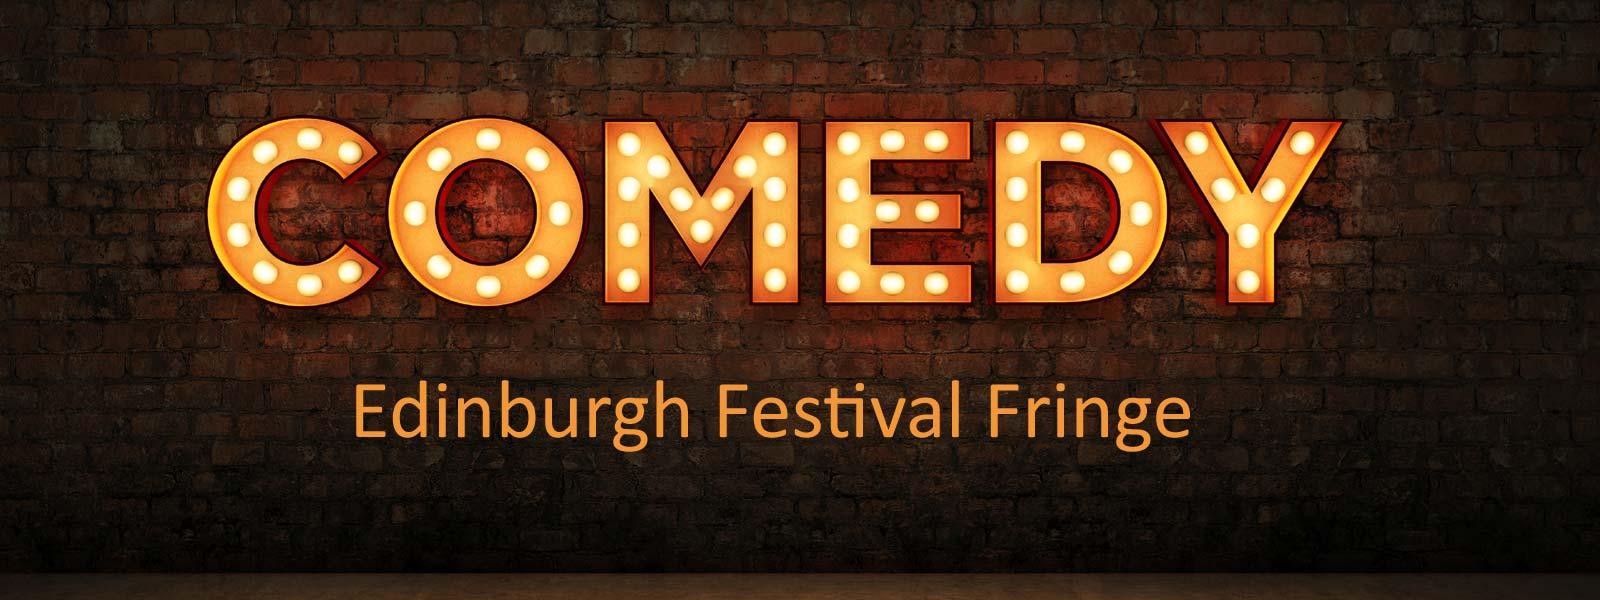 Brick wall with writing Comedy Edinburgh Festival Fringe